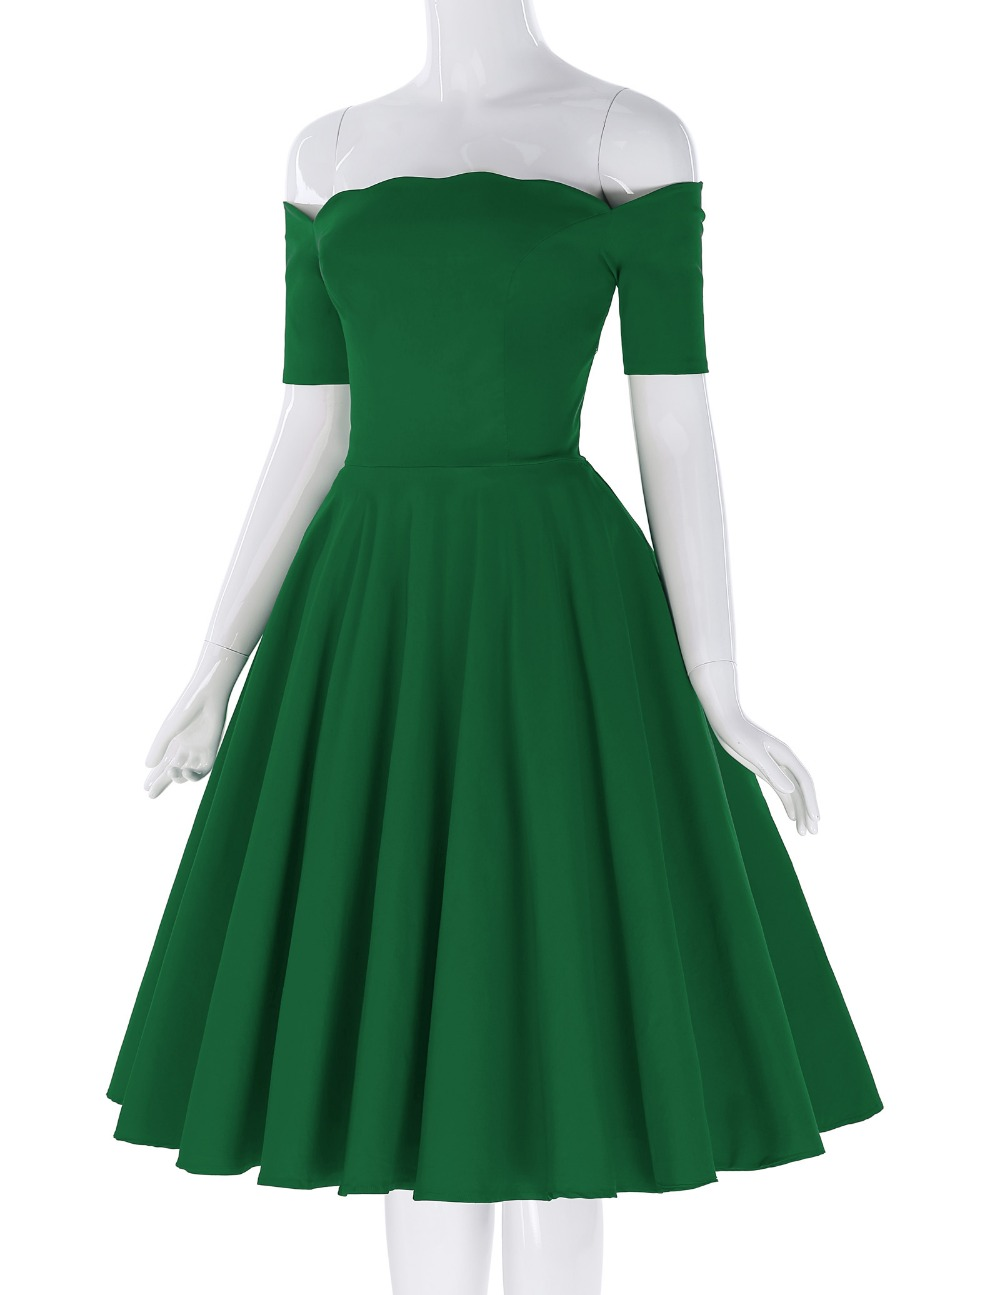 Belle Poque 17 Women Dress Robe Vintage Off Shoulder Black Summer Dress Jurken 1950s 60s Retro Rockabilly Swing Party Dresses 22